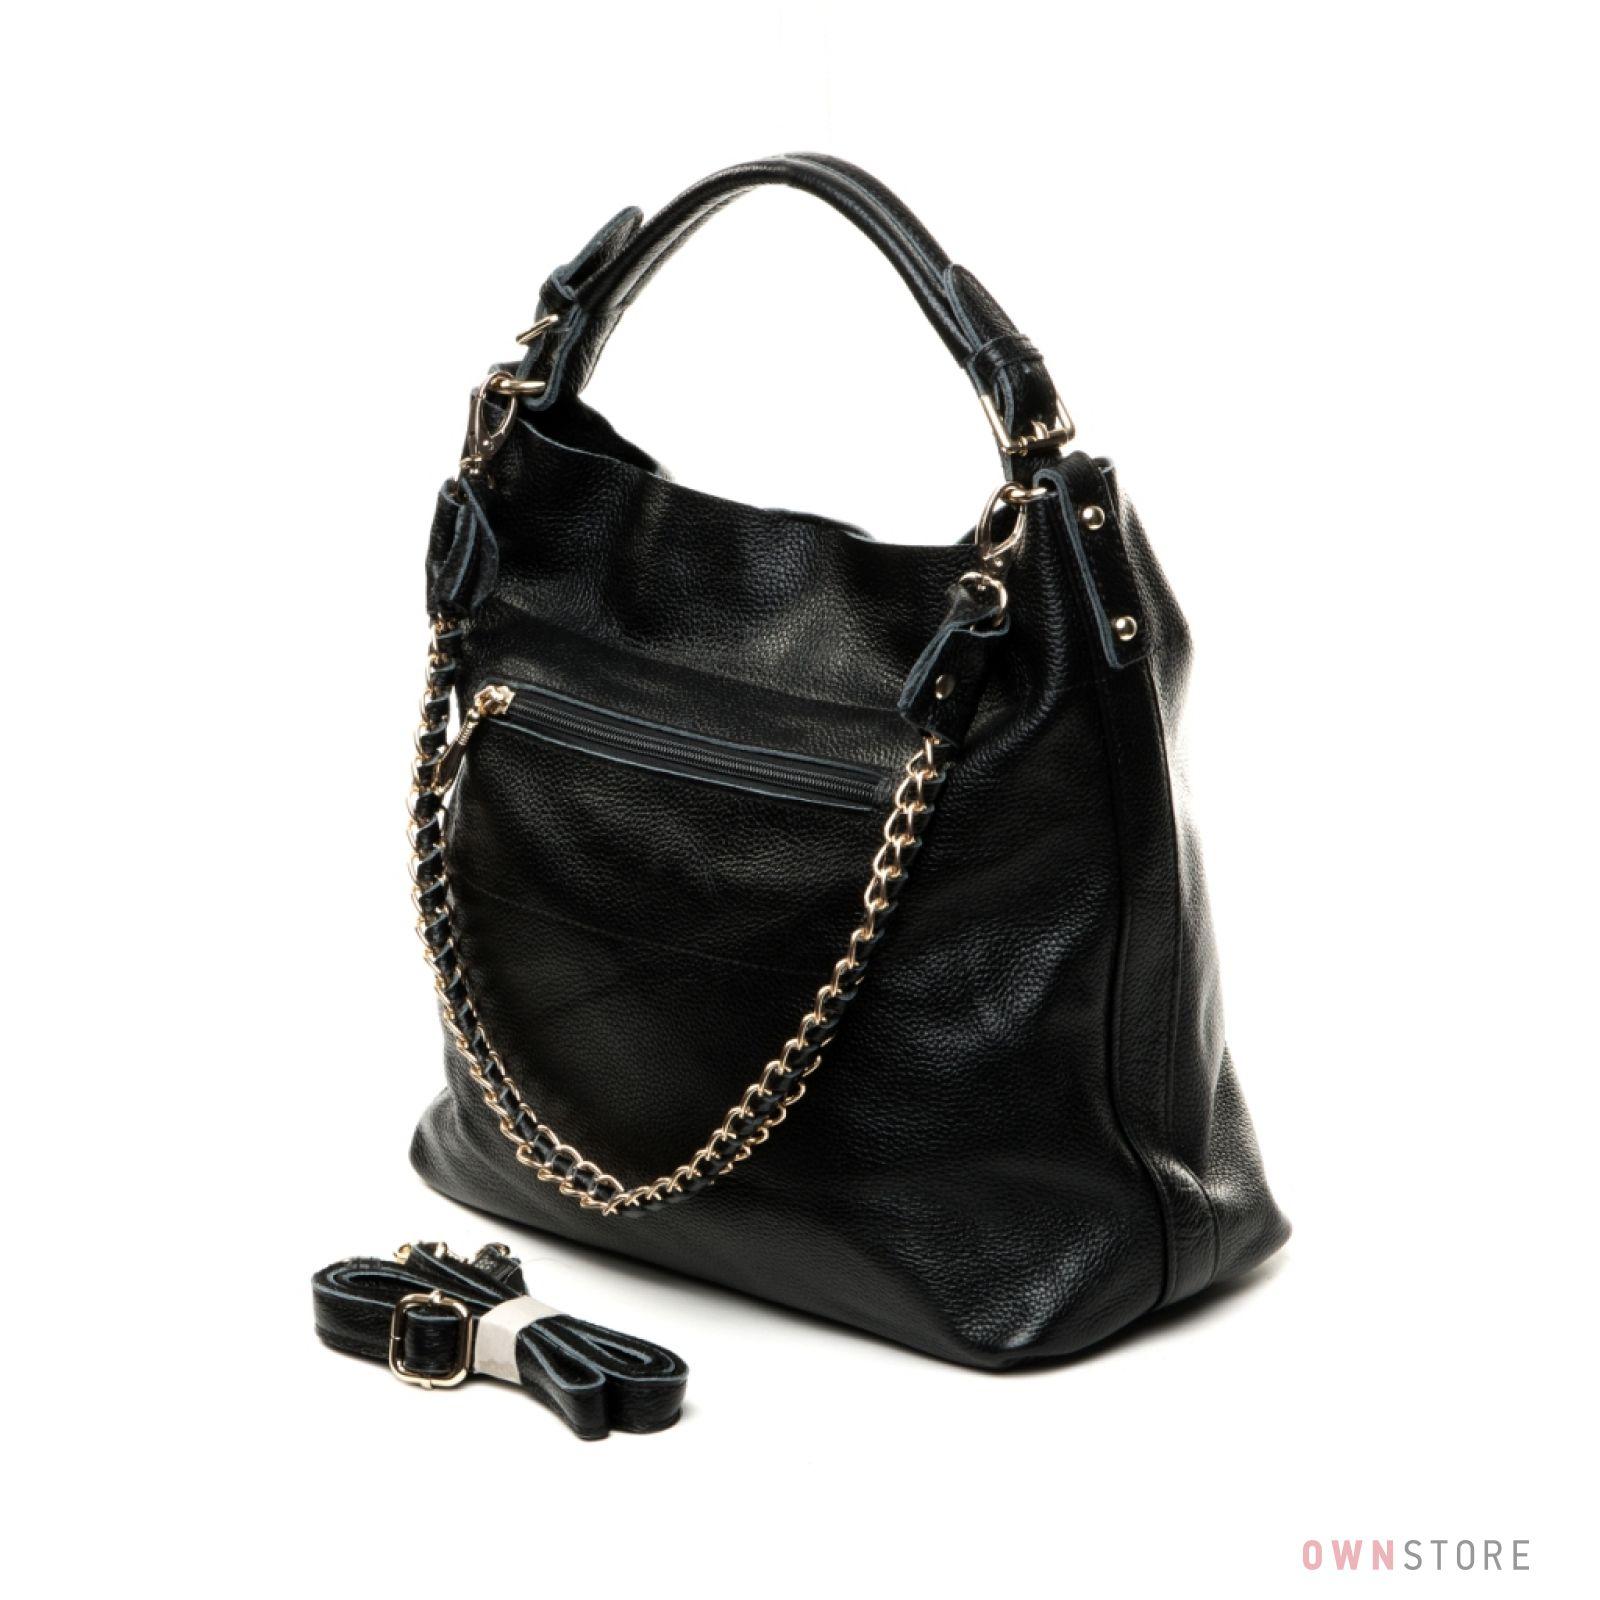 5be4044eeedc Черная мягкая женская кожаная сумка Meglio(арт.1362)